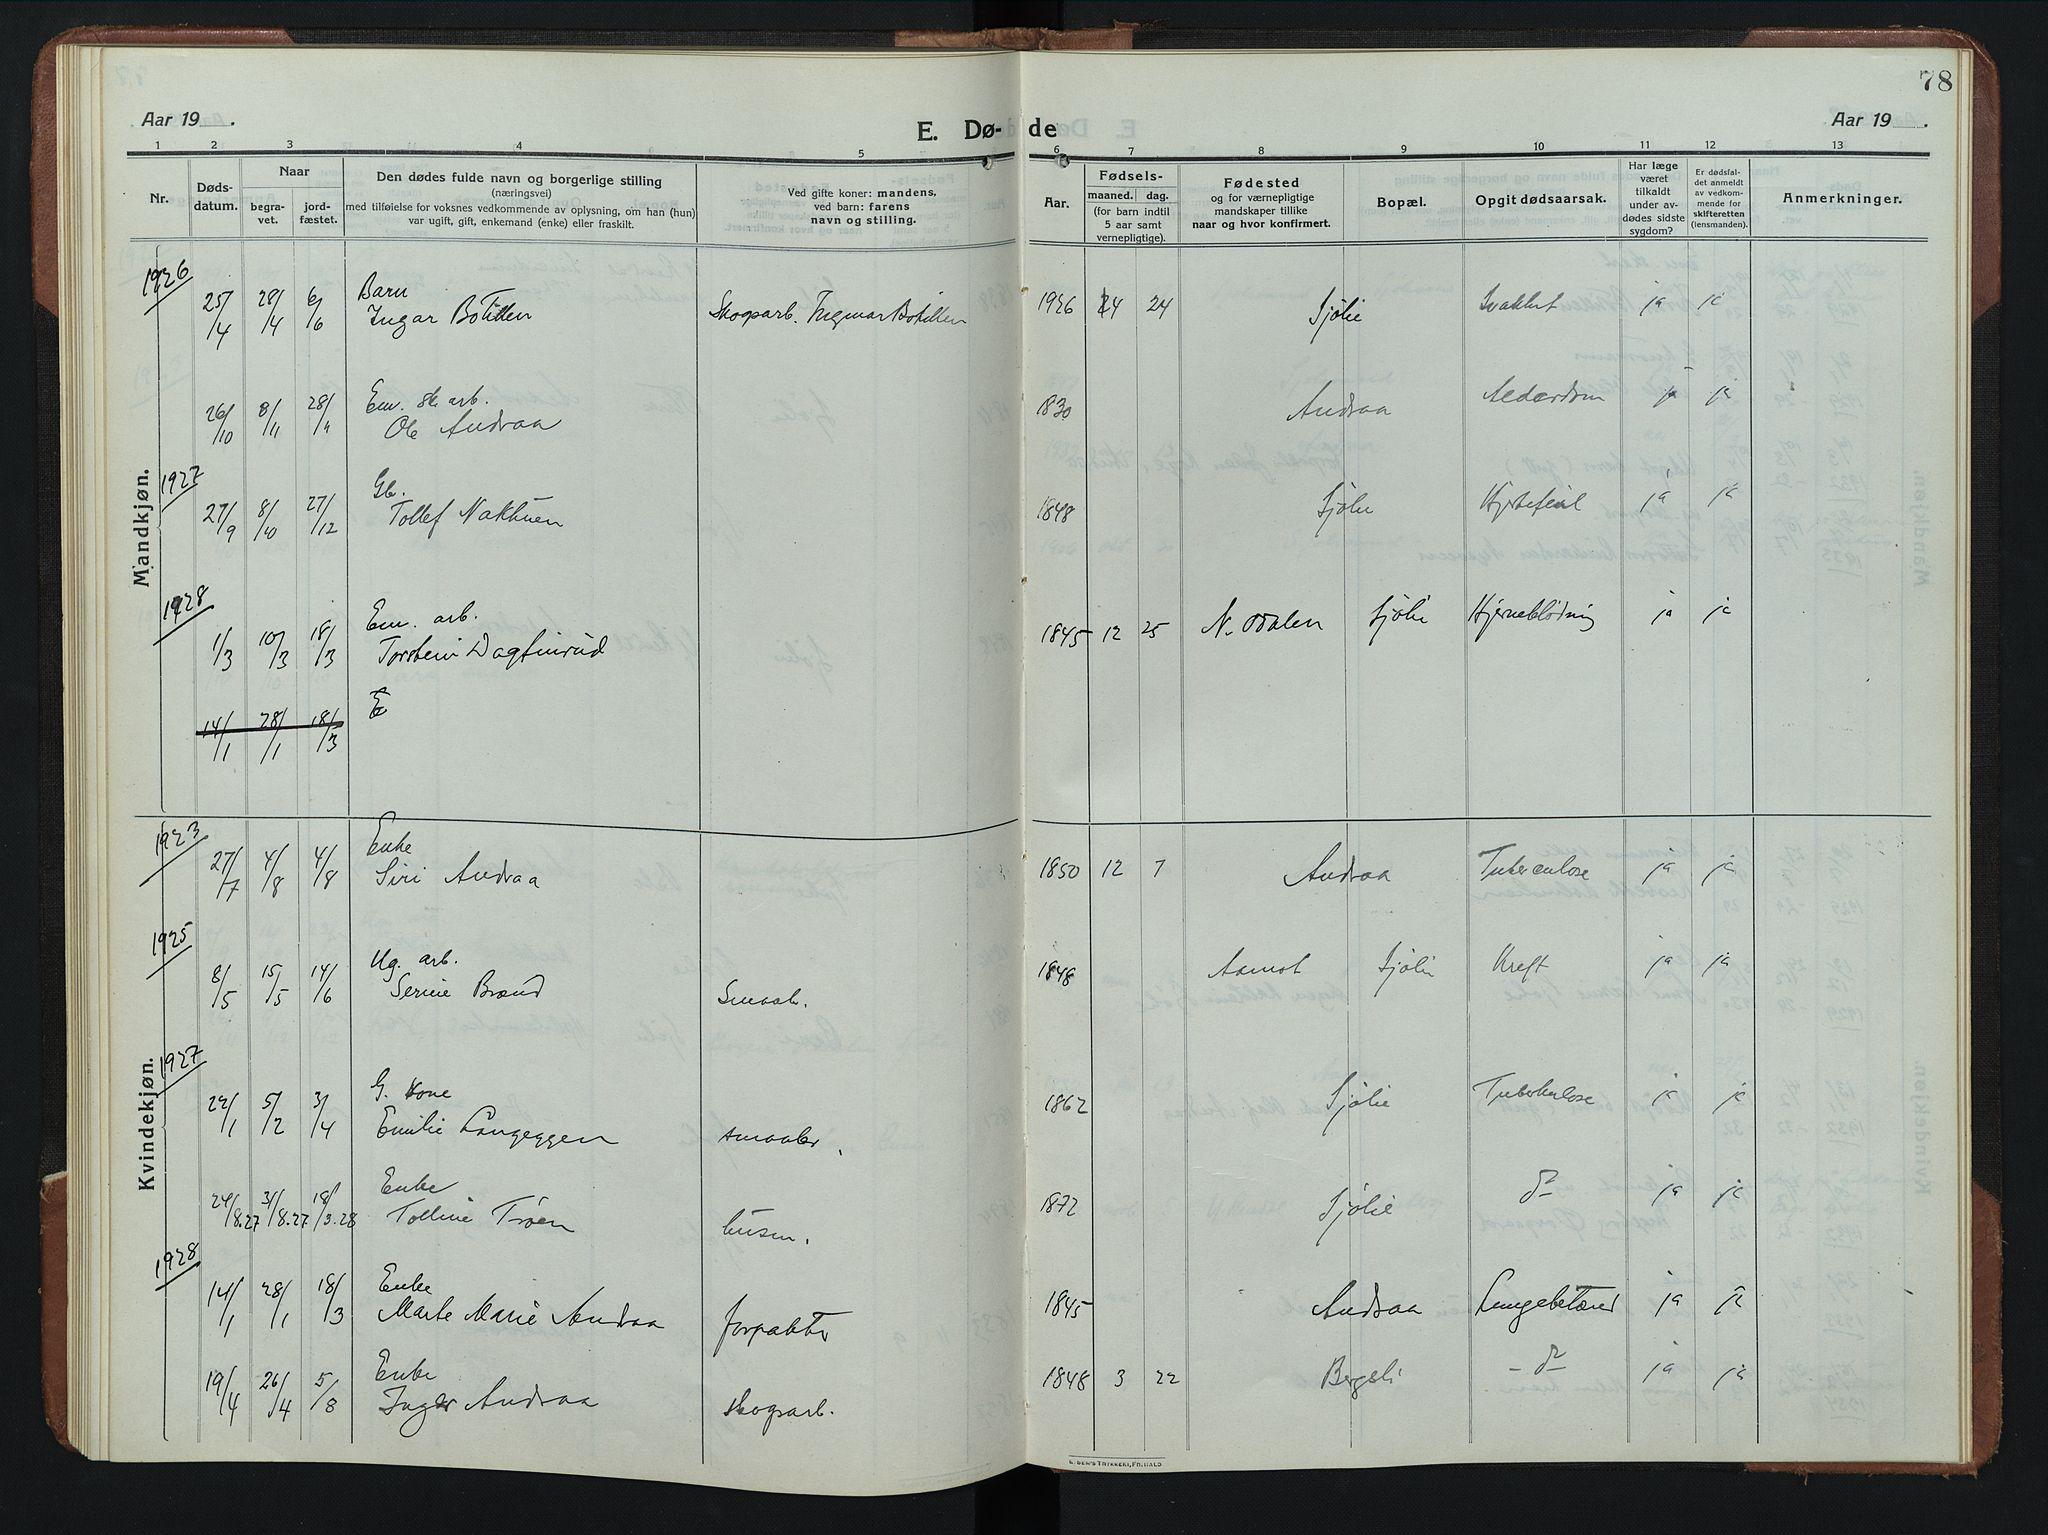 SAH, Rendalen prestekontor, H/Ha/Hab/L0008: Parish register (copy) no. 8, 1914-1948, p. 78